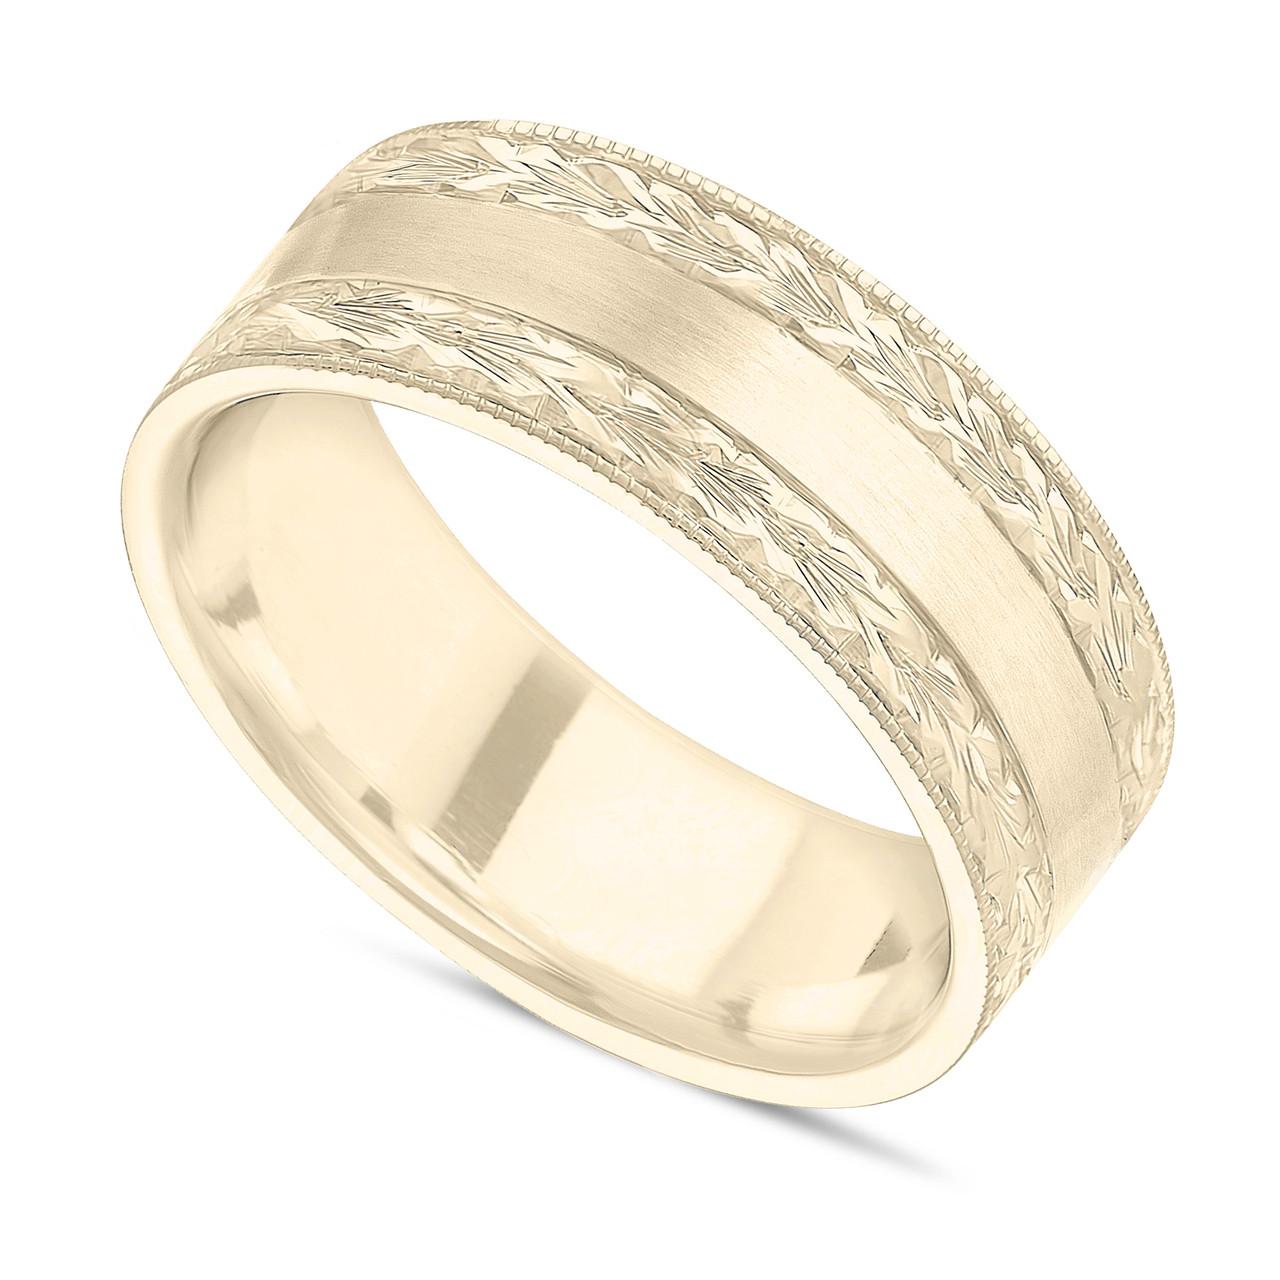 Unique Hand Engraved Wedding Band, Men's Wedding Ring